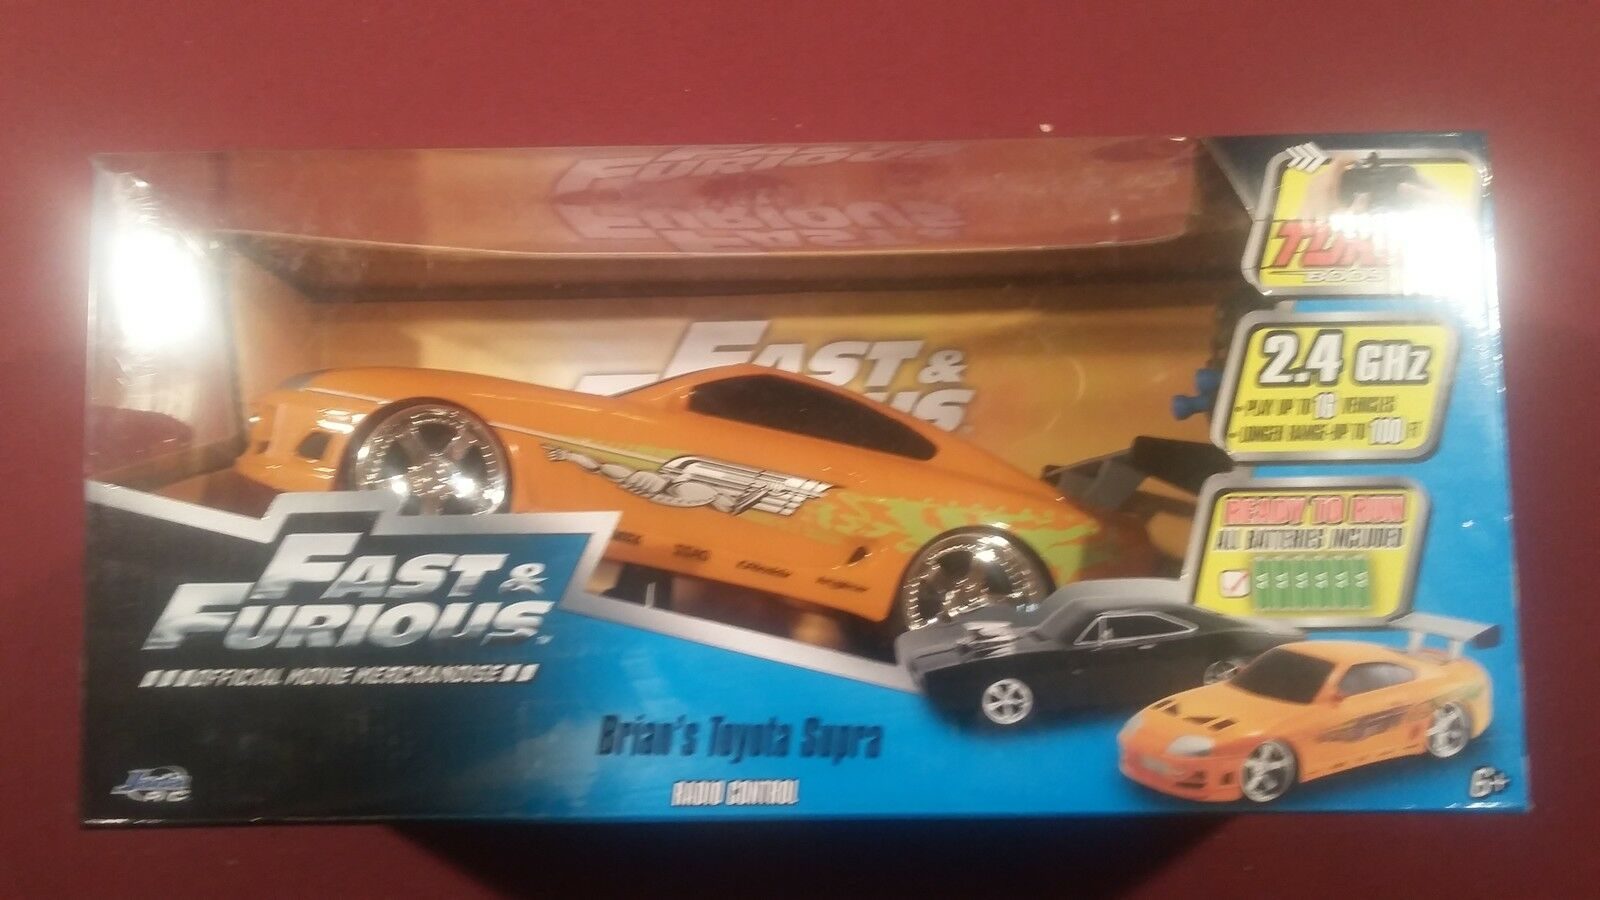 Jada Toys Fast & Furious RC Toyota Supra Vehicle (1 16 Scale) orange (NEW)